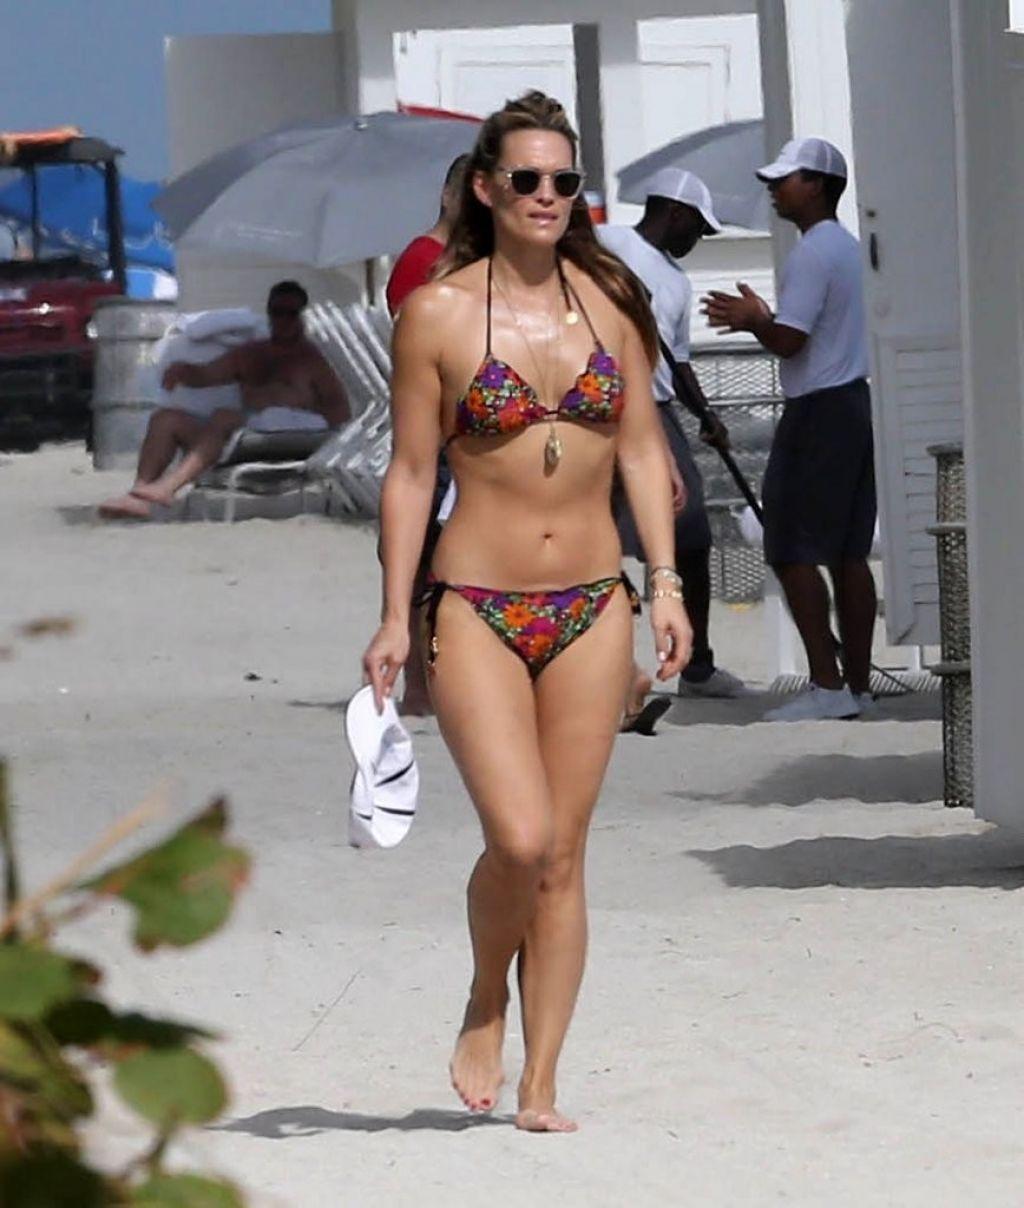 Molly Sims In A Bikini Miami December 23rd 2013